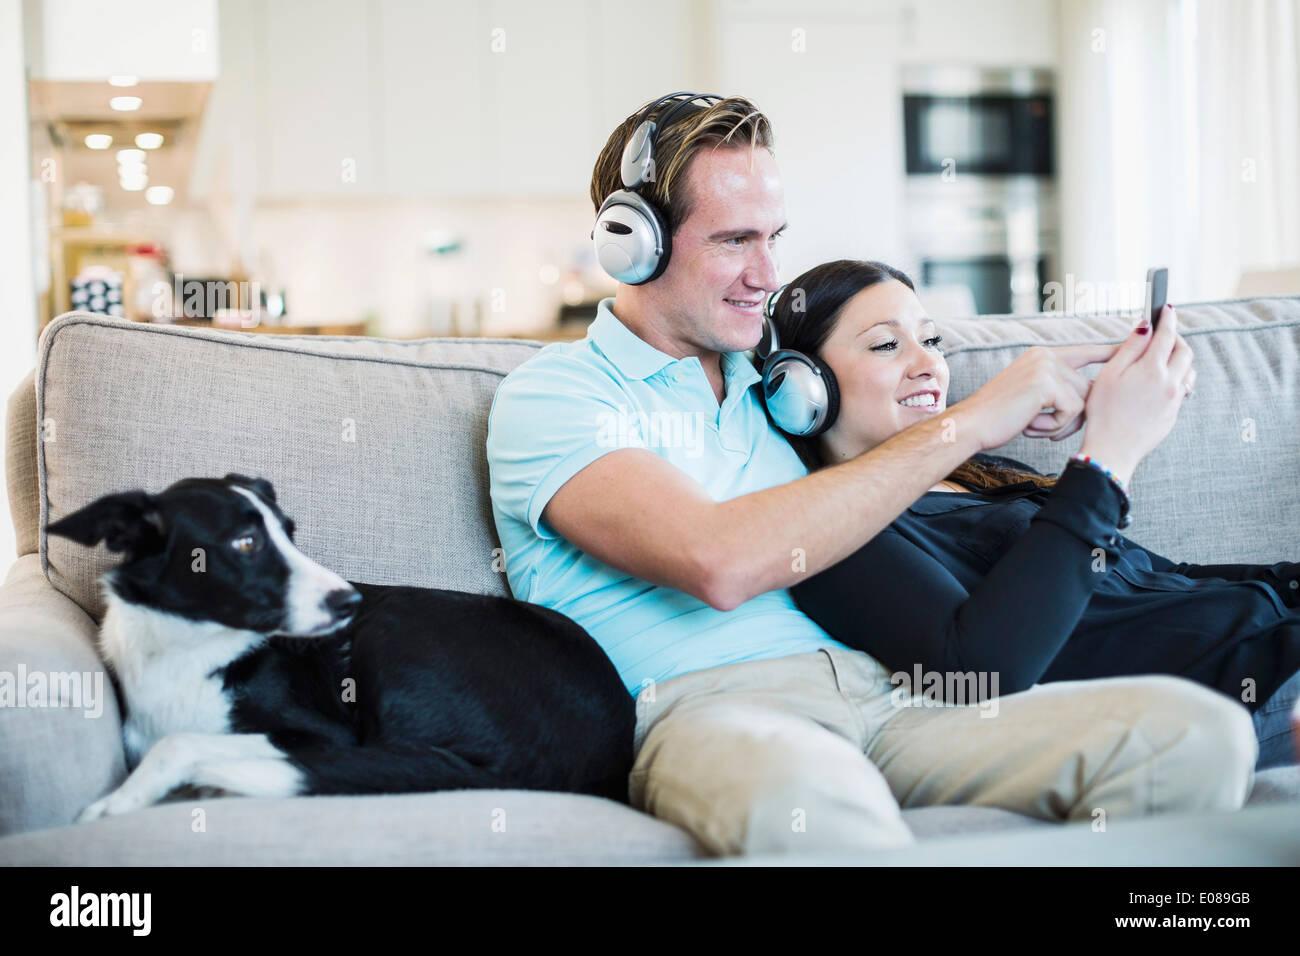 Couple listening to headphones with dog sitting on sofa - Stock Image